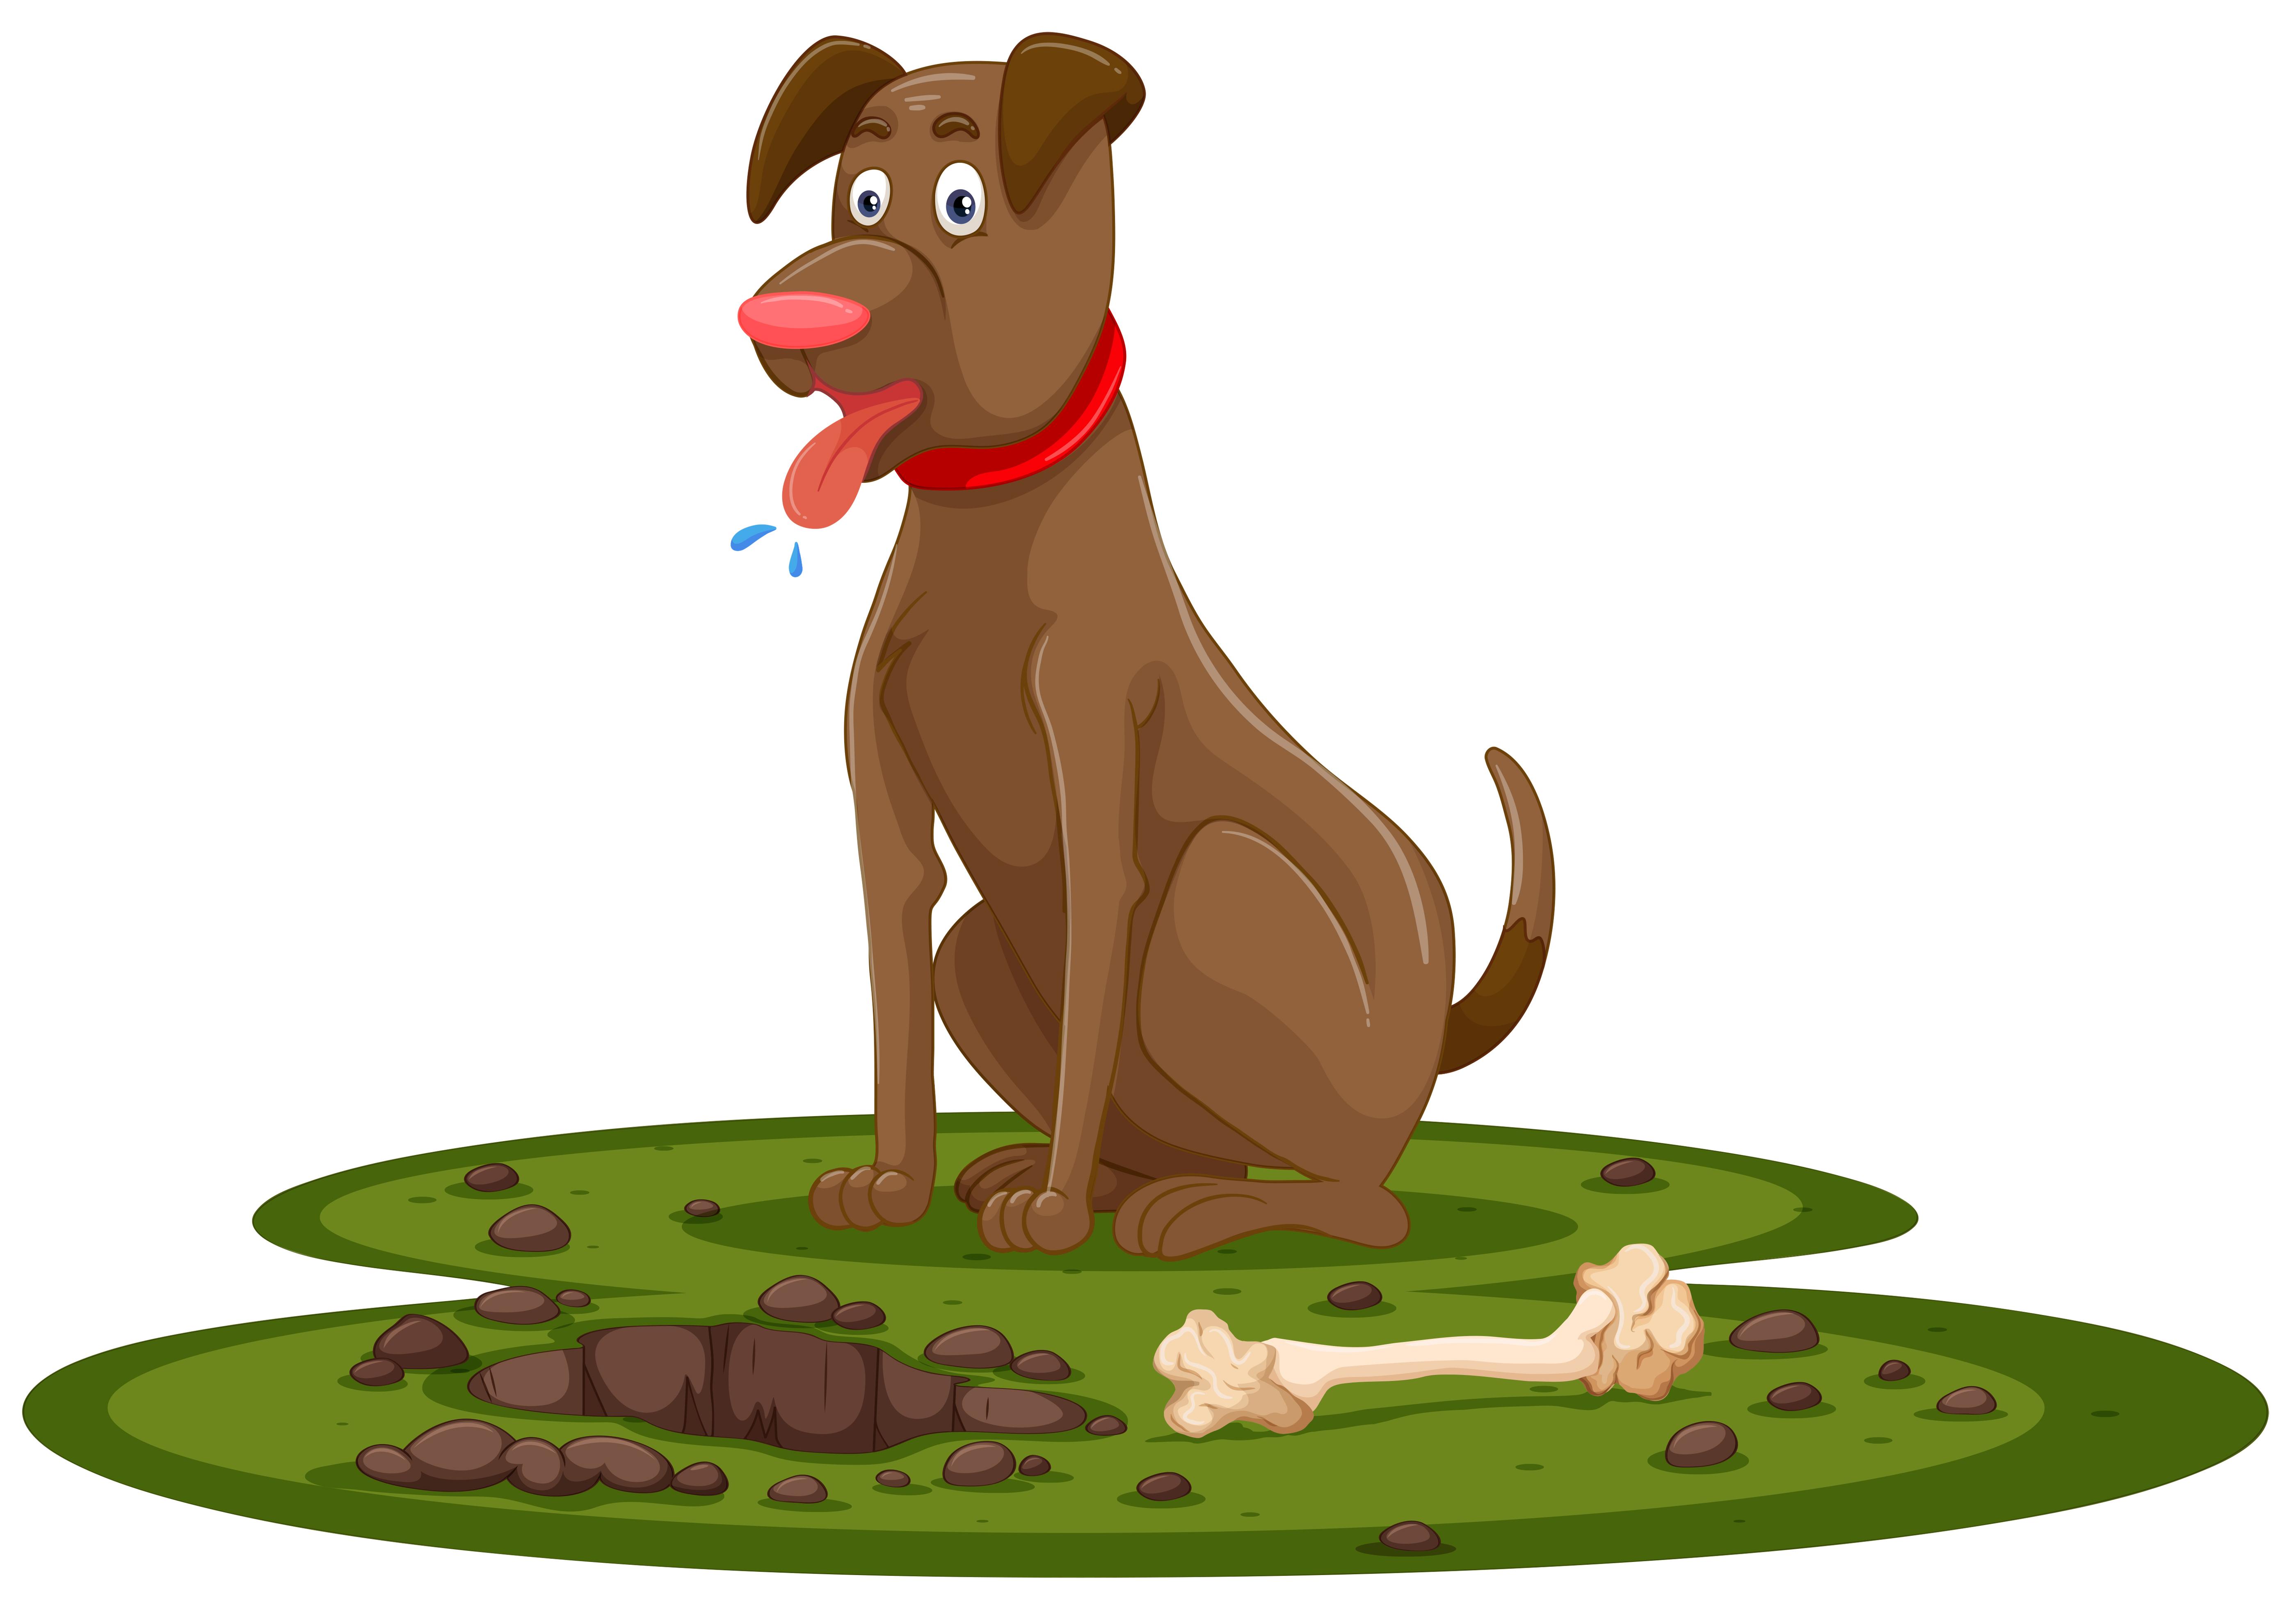 Dog Digging Free Vector Art - (32 Free Downloads) (5597 x 3930 Pixel)